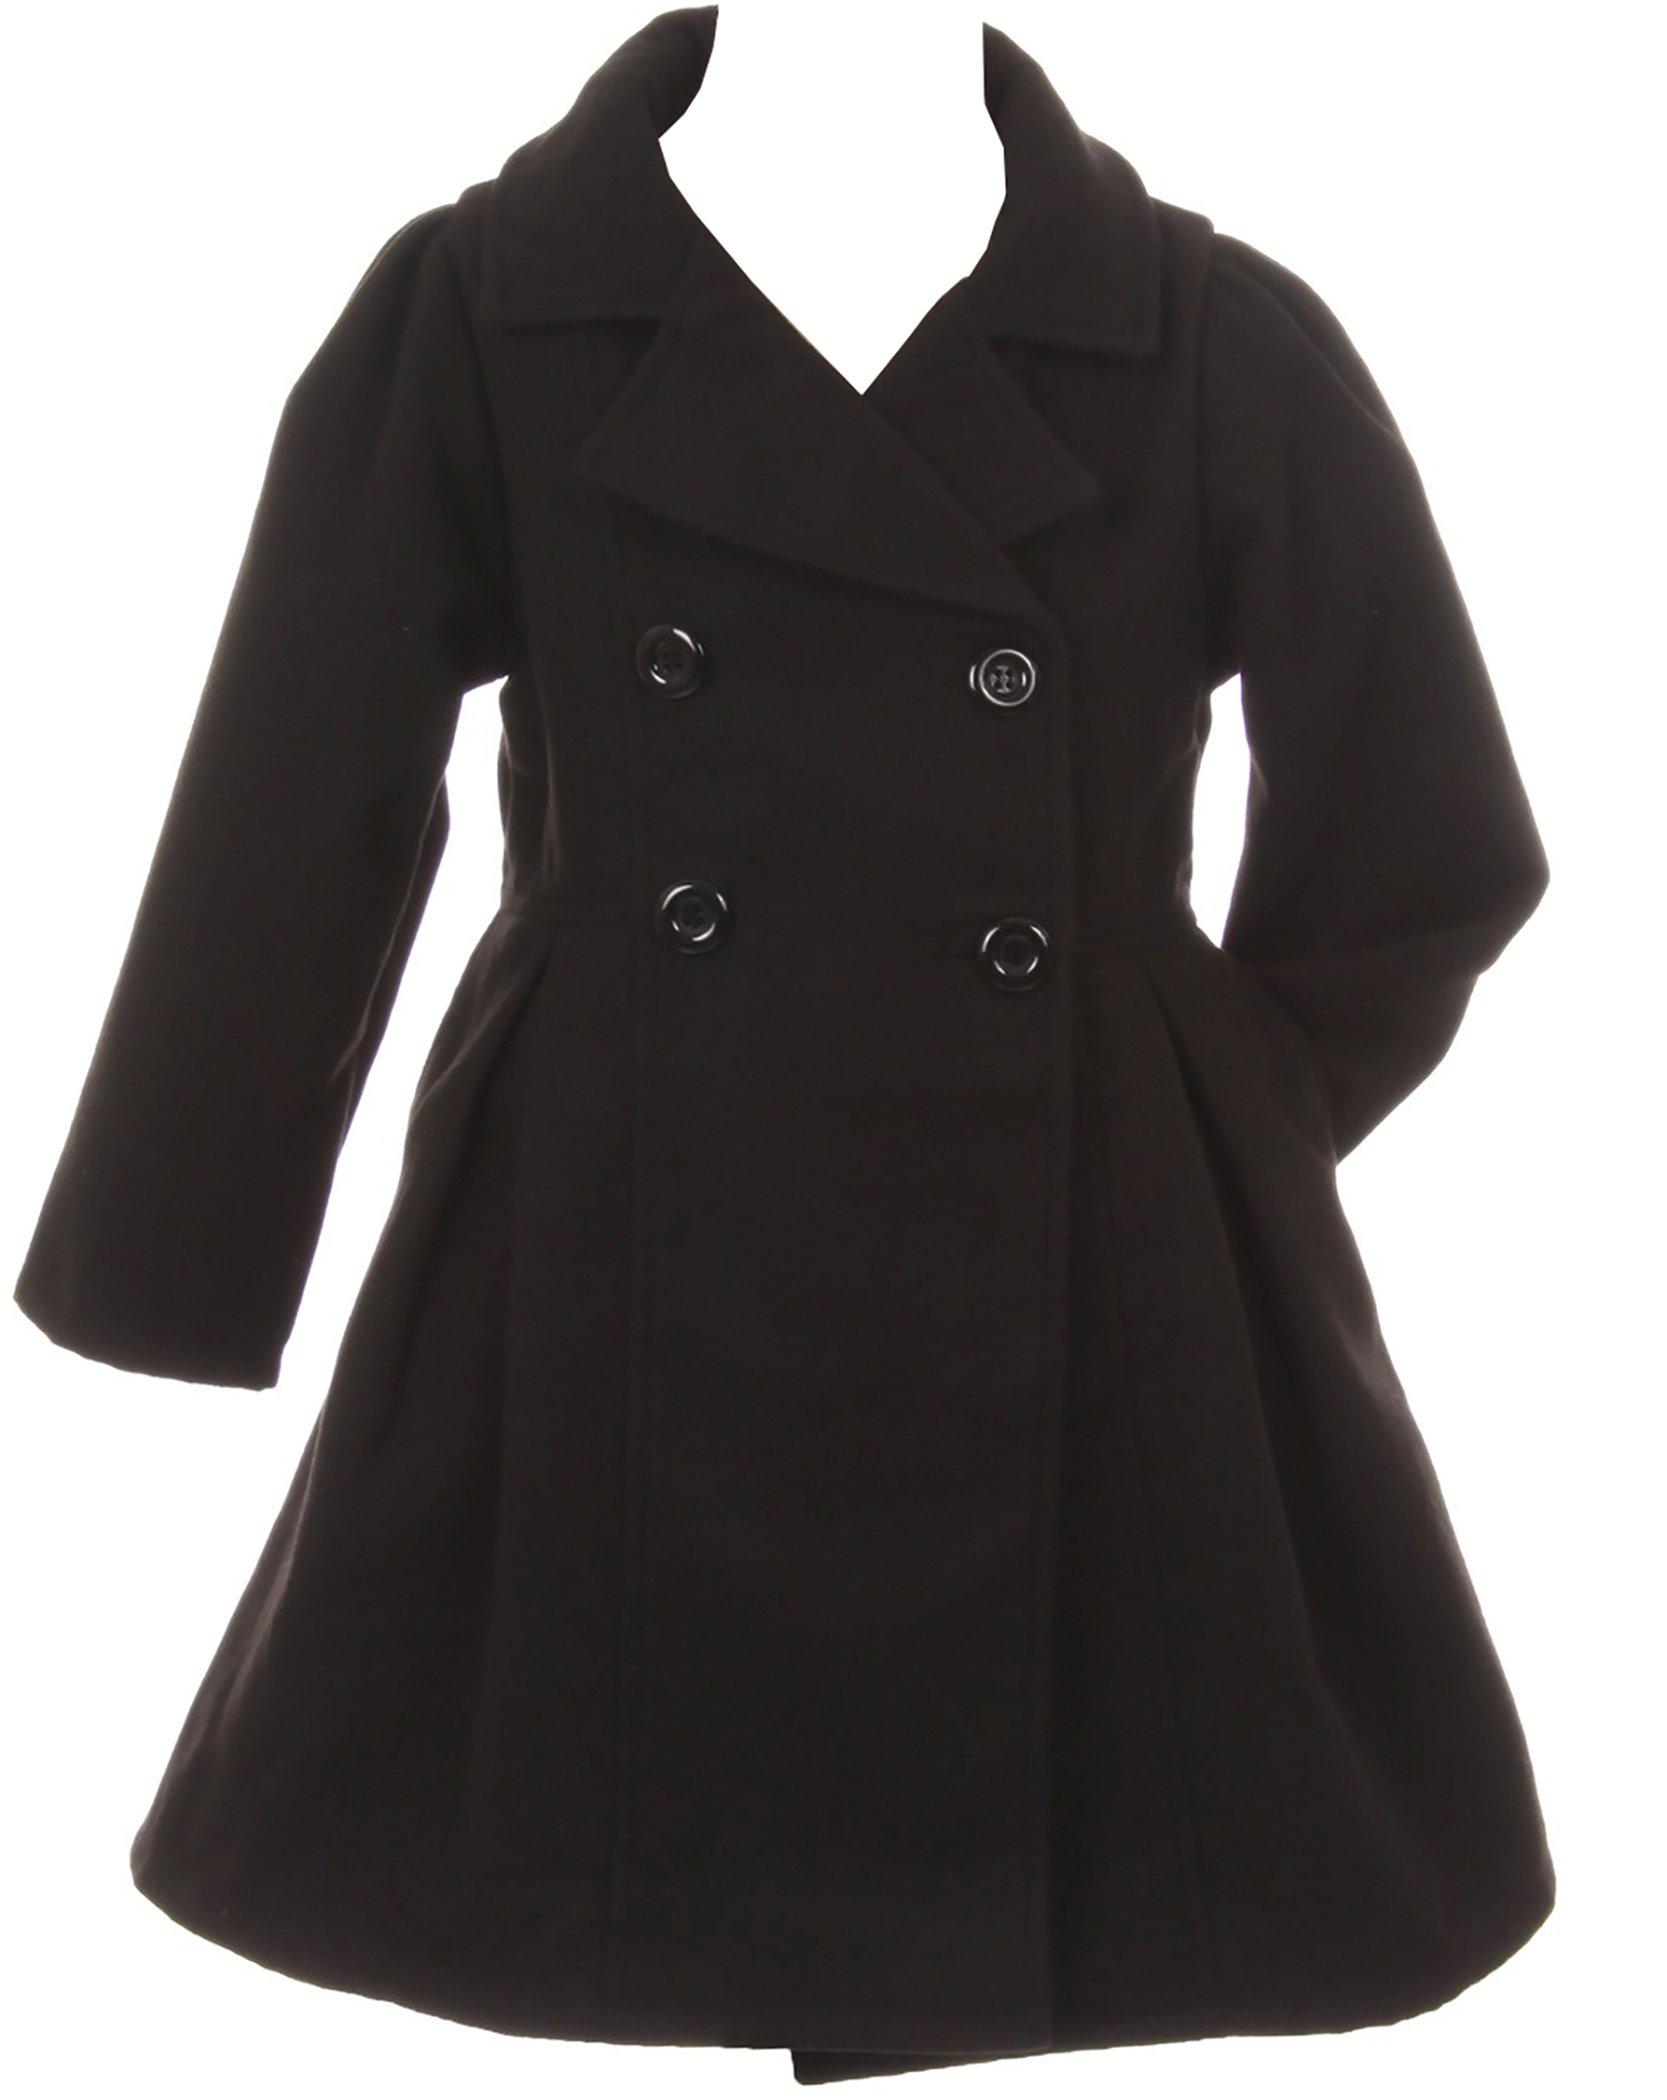 Dreamer P Big Girls' Cozy Long Sleeve Collar Button Flower Girl Coat Jacket Cover Outerwear Black 8 (J20K49S)